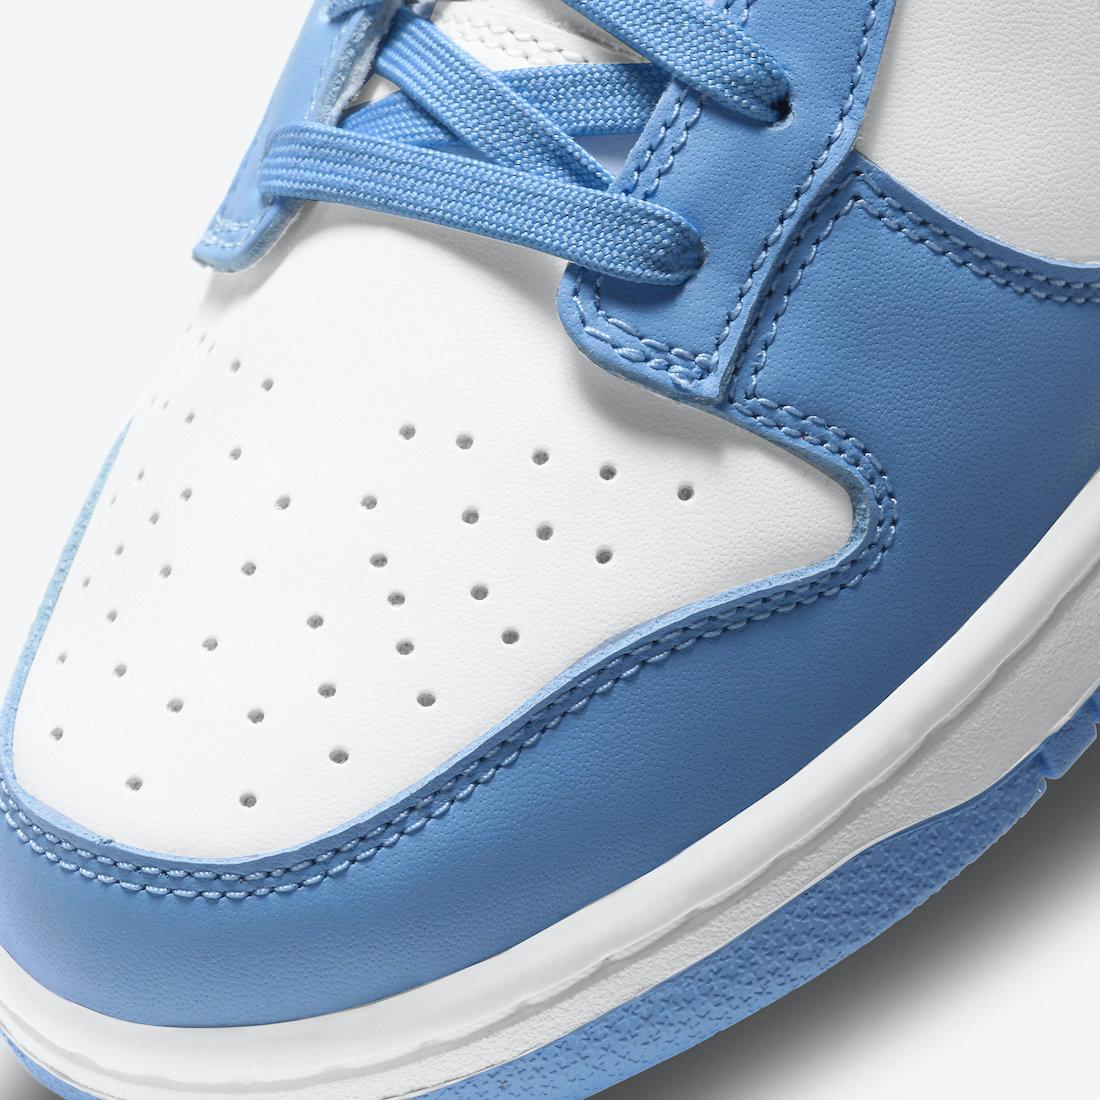 Nike-Dunk-Low-University-Blue-DD1391-102-Release-Date-Price-6